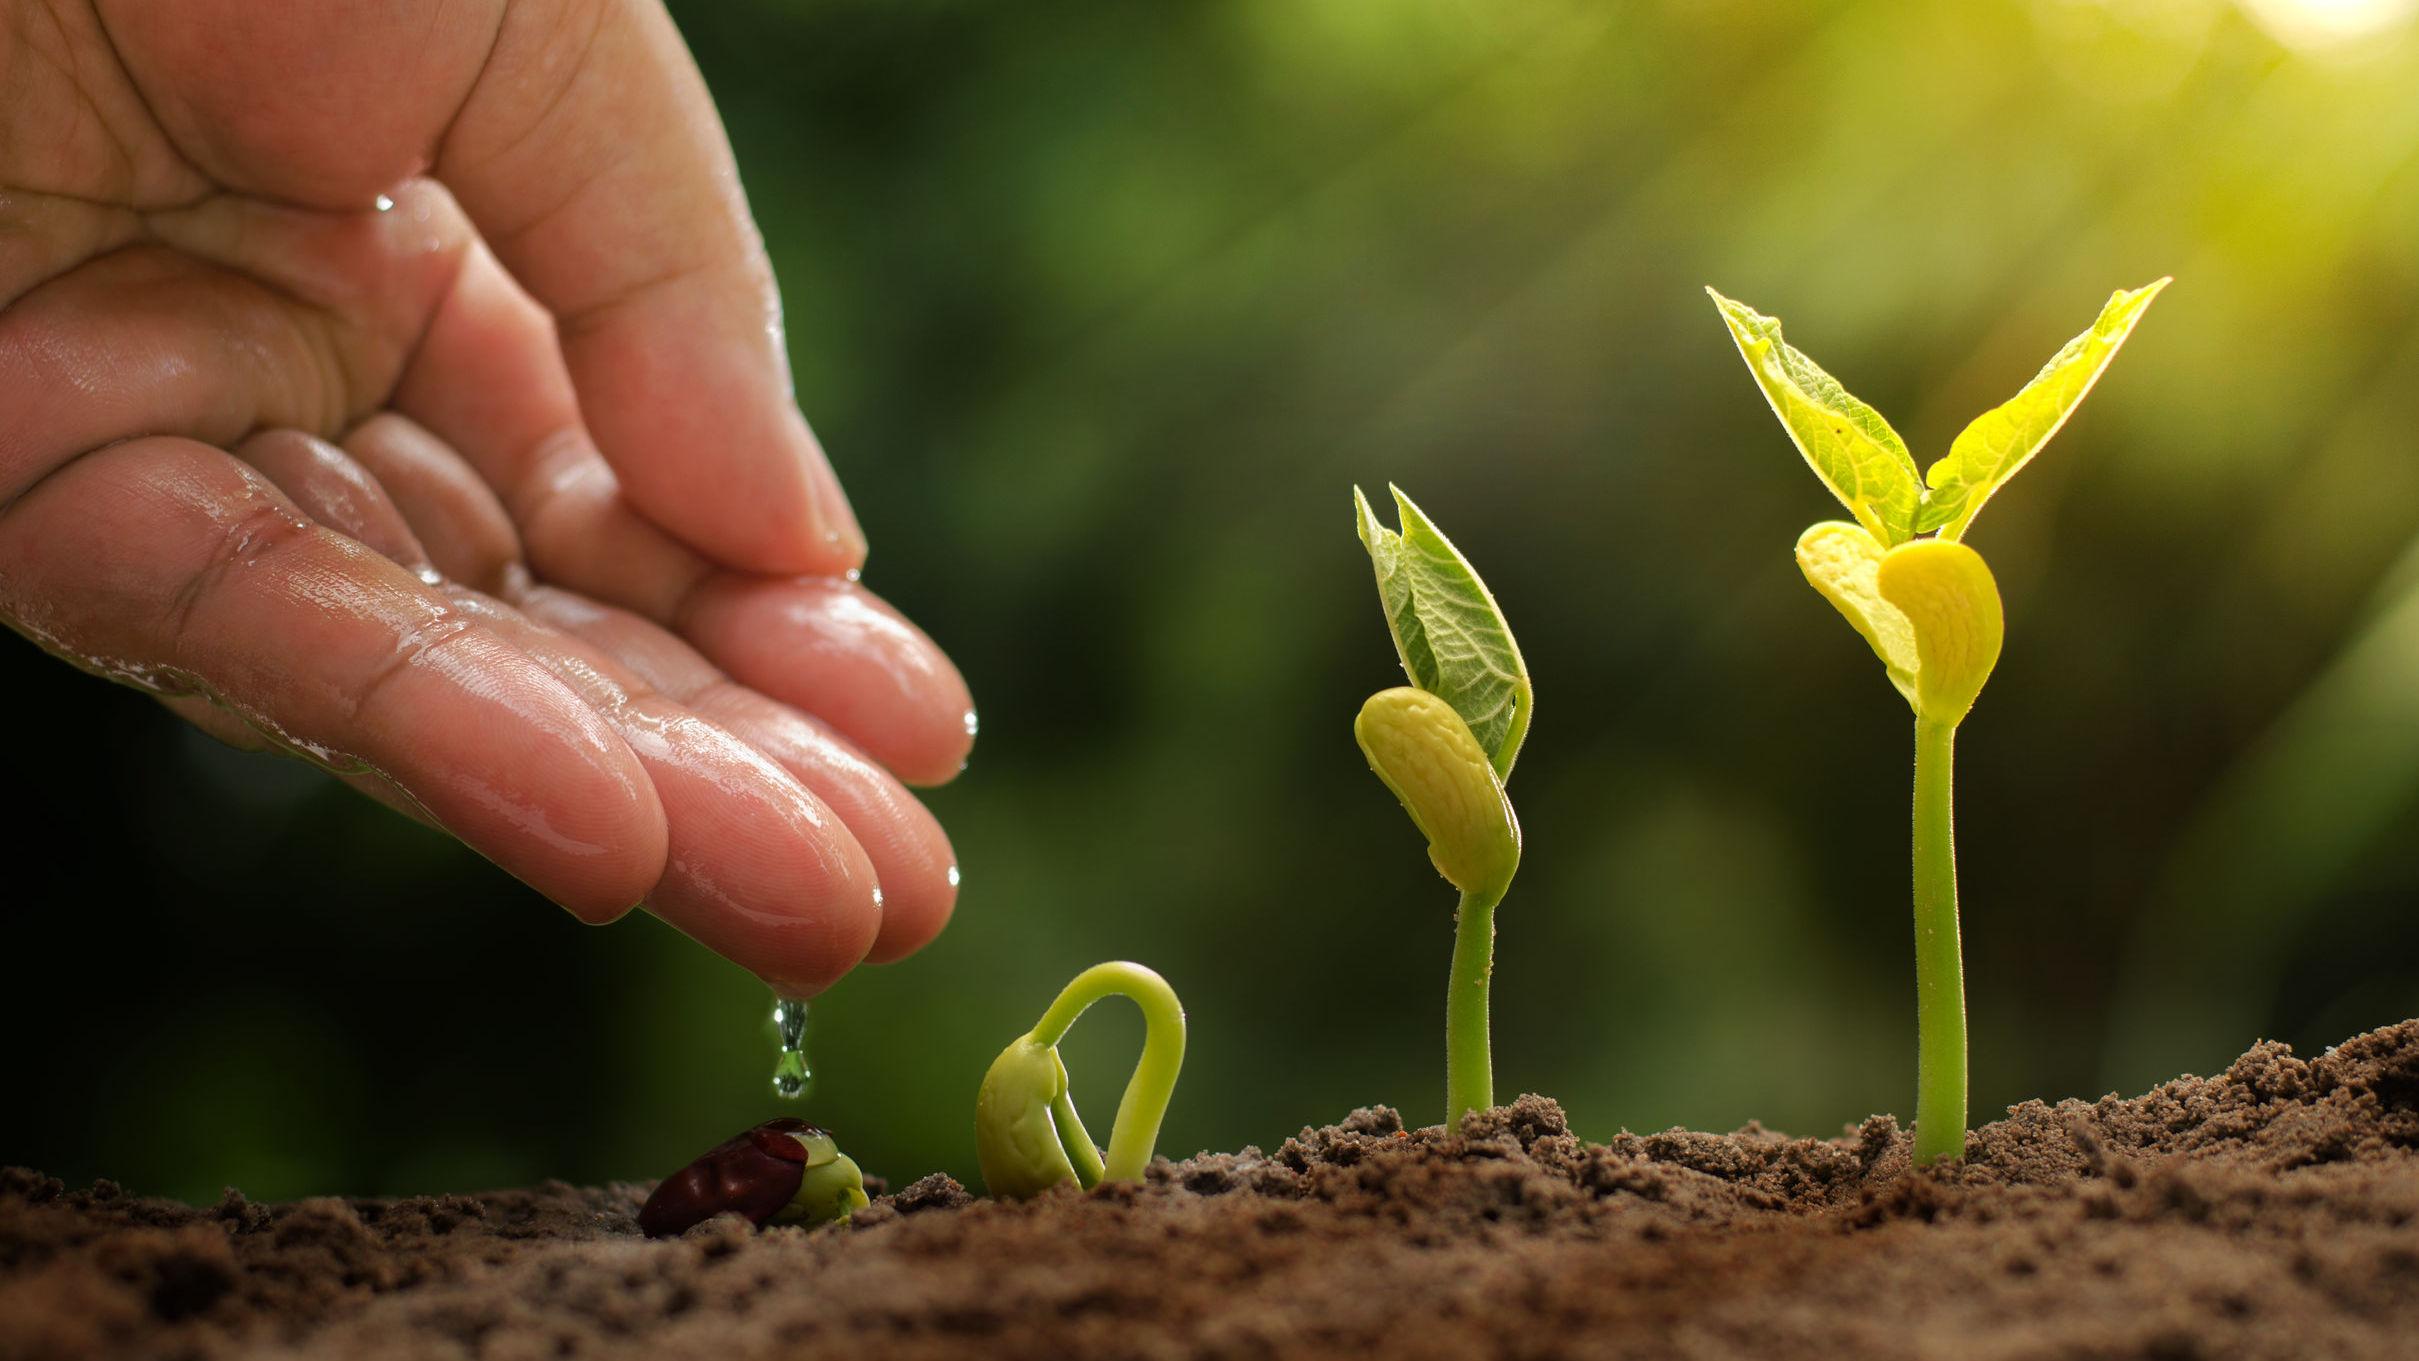 Duurzame groei